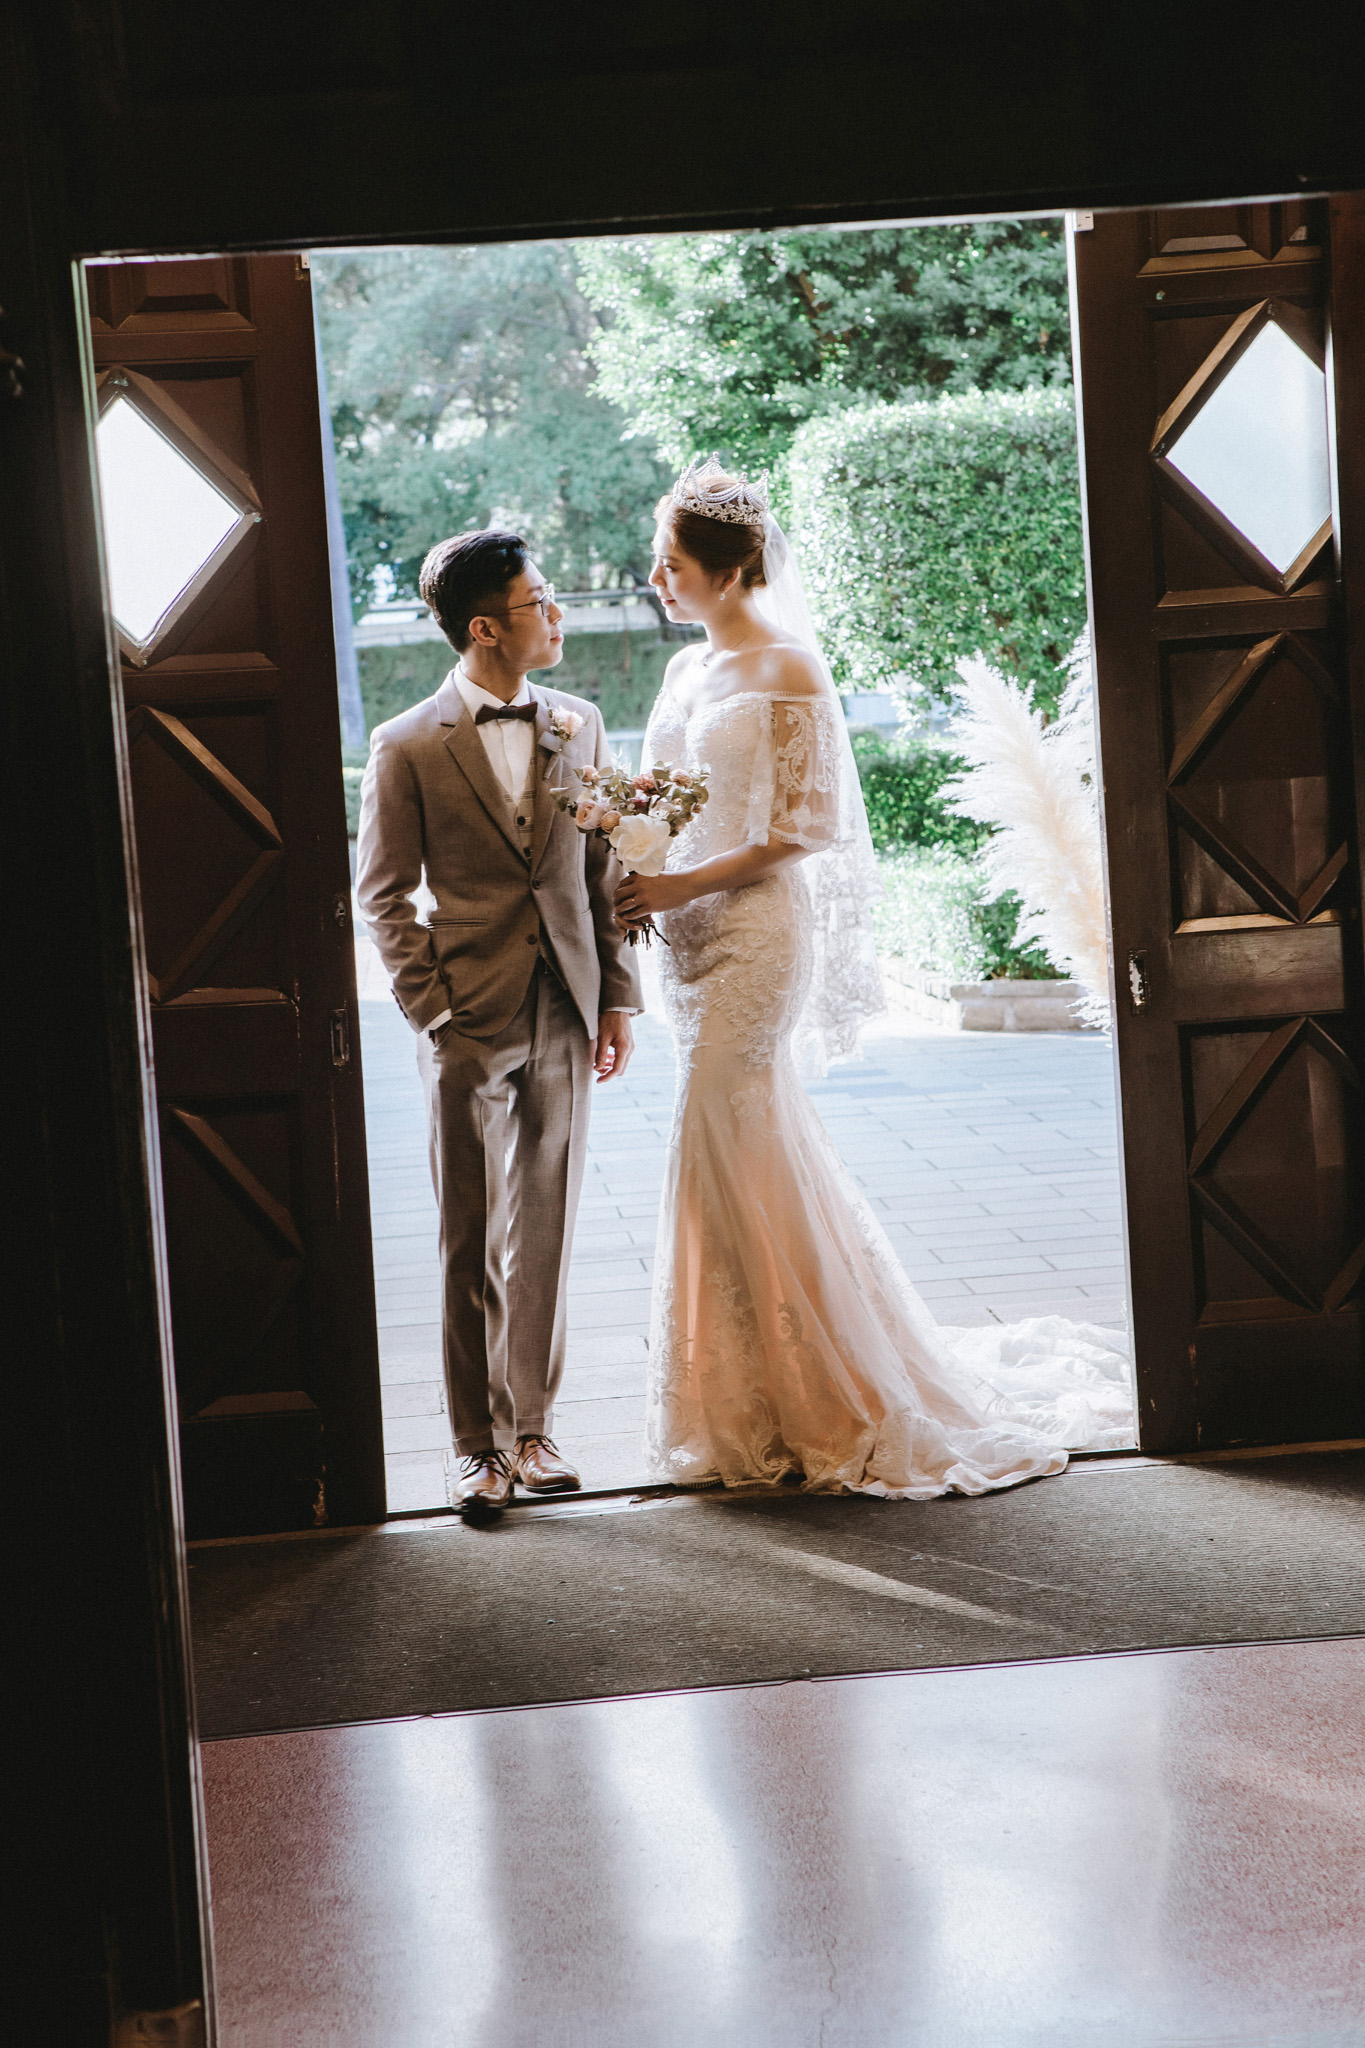 EW 台北婚攝 居米 濟南教會 Brick Yard 33 美軍俱樂部 婚禮 婚宴-57